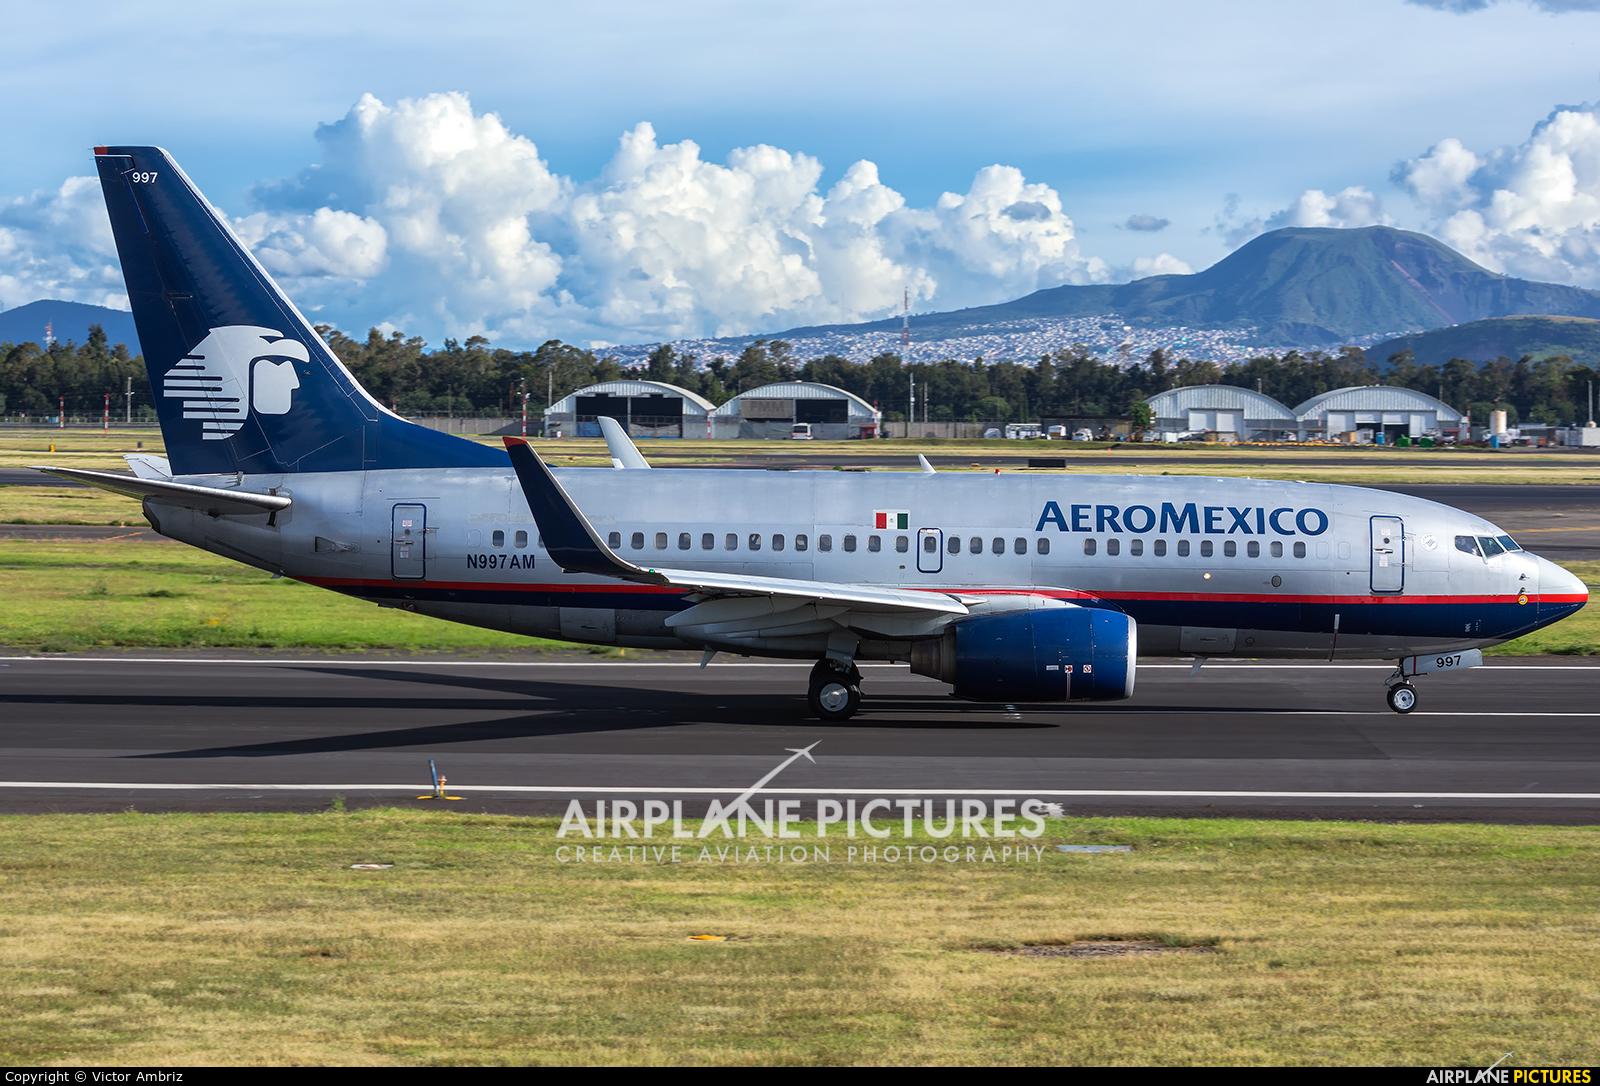 Aeromexico N997AM aircraft at Mexico City - Licenciado Benito Juarez Intl